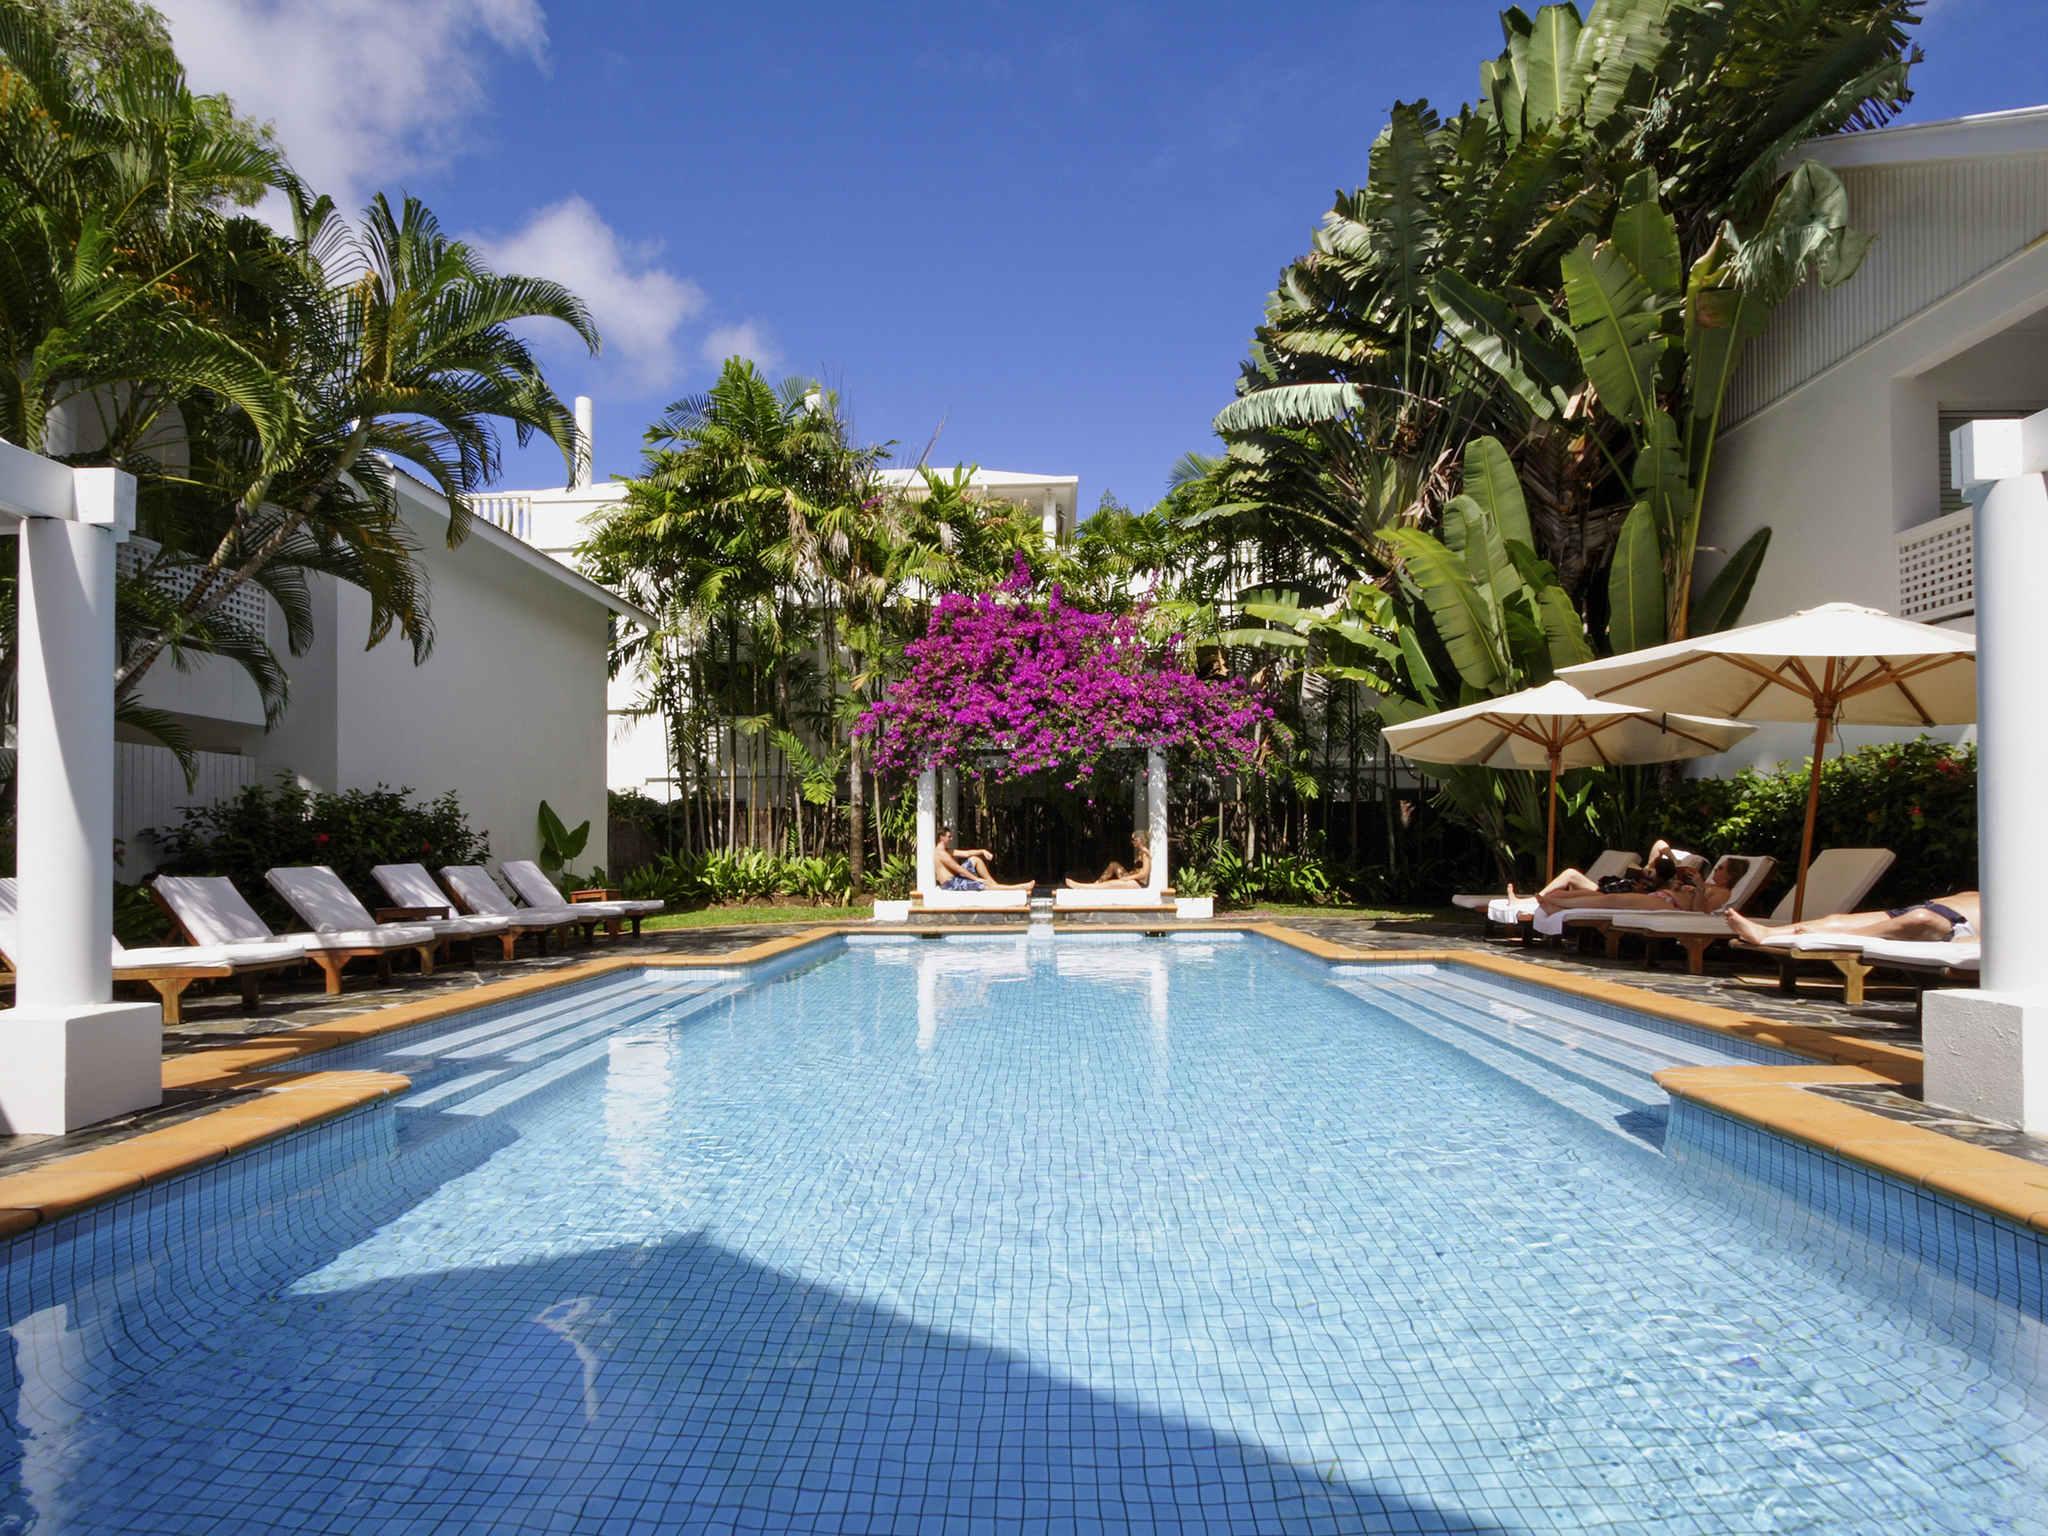 فندق - The Reef House Palm Cove - MGallery by Sofitel